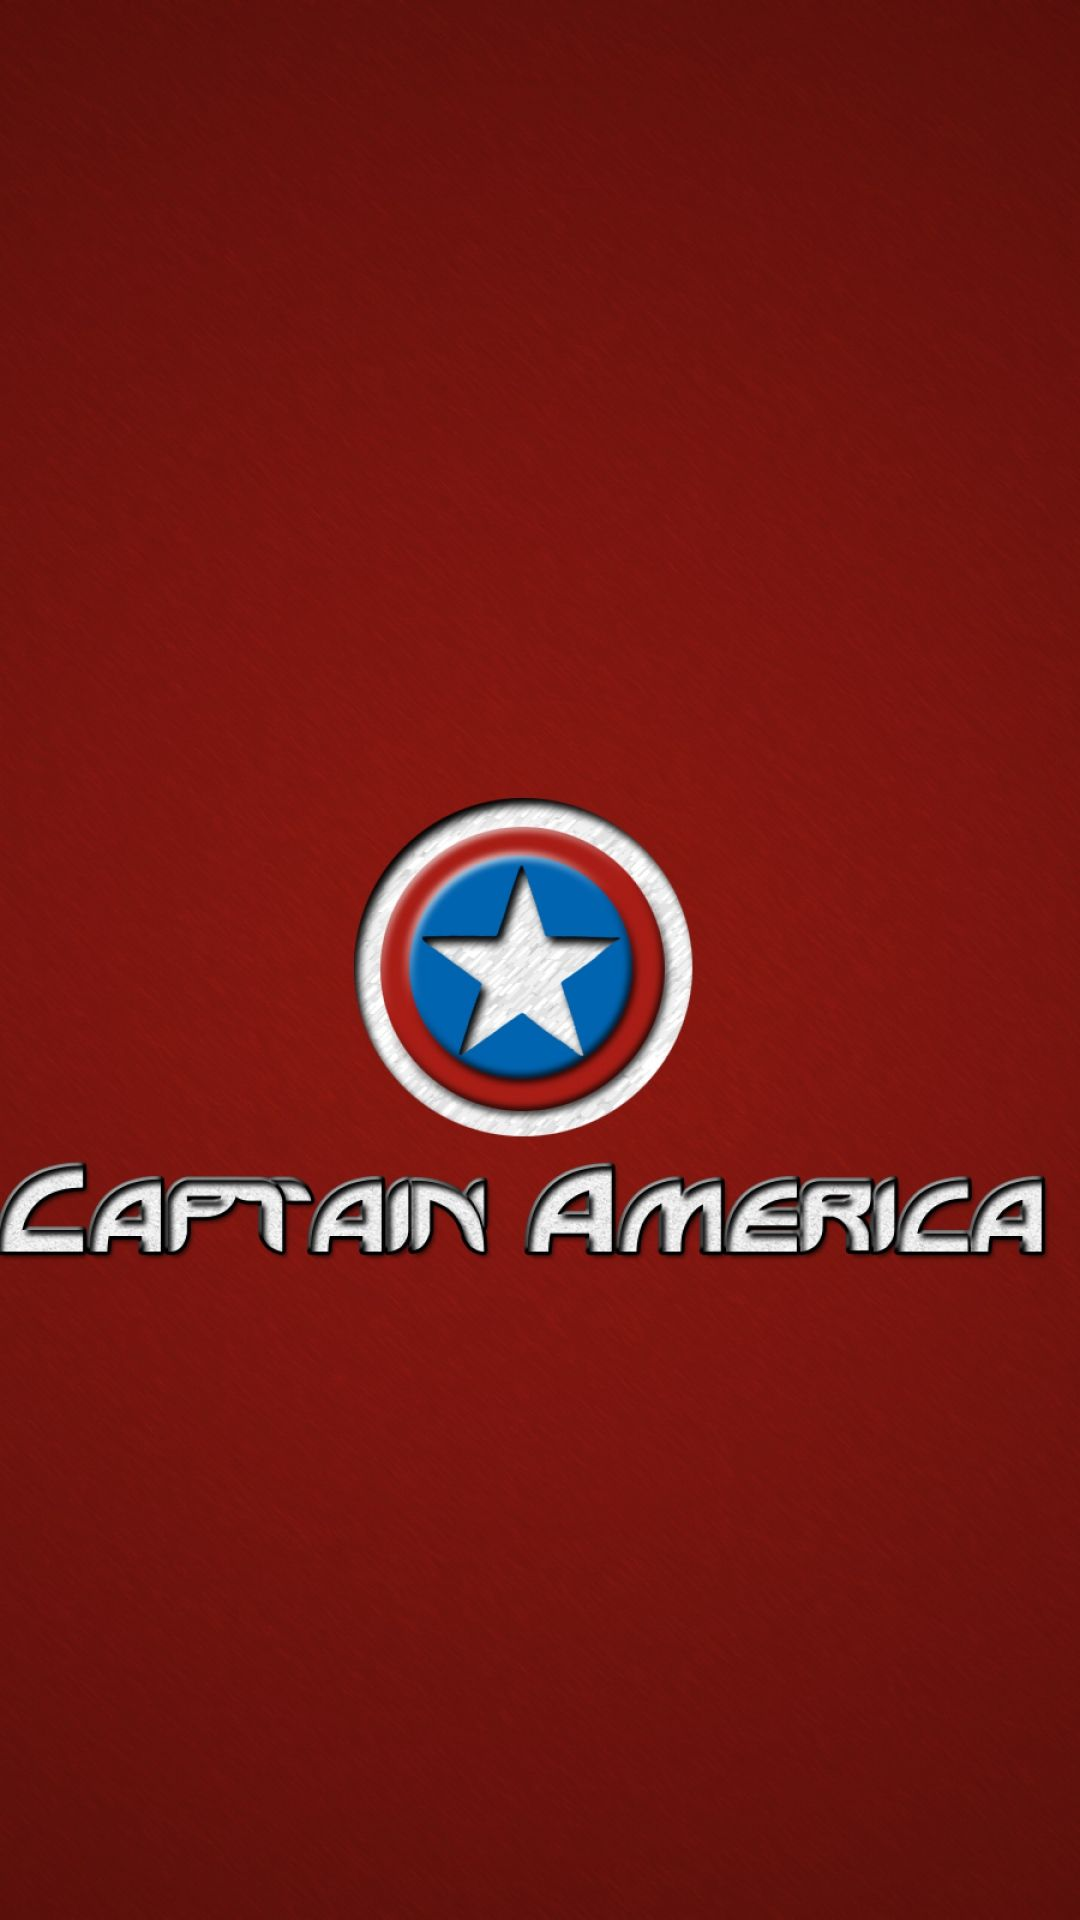 Avengers Logo iPhone Wallpapers - Top Free Avengers Logo ...